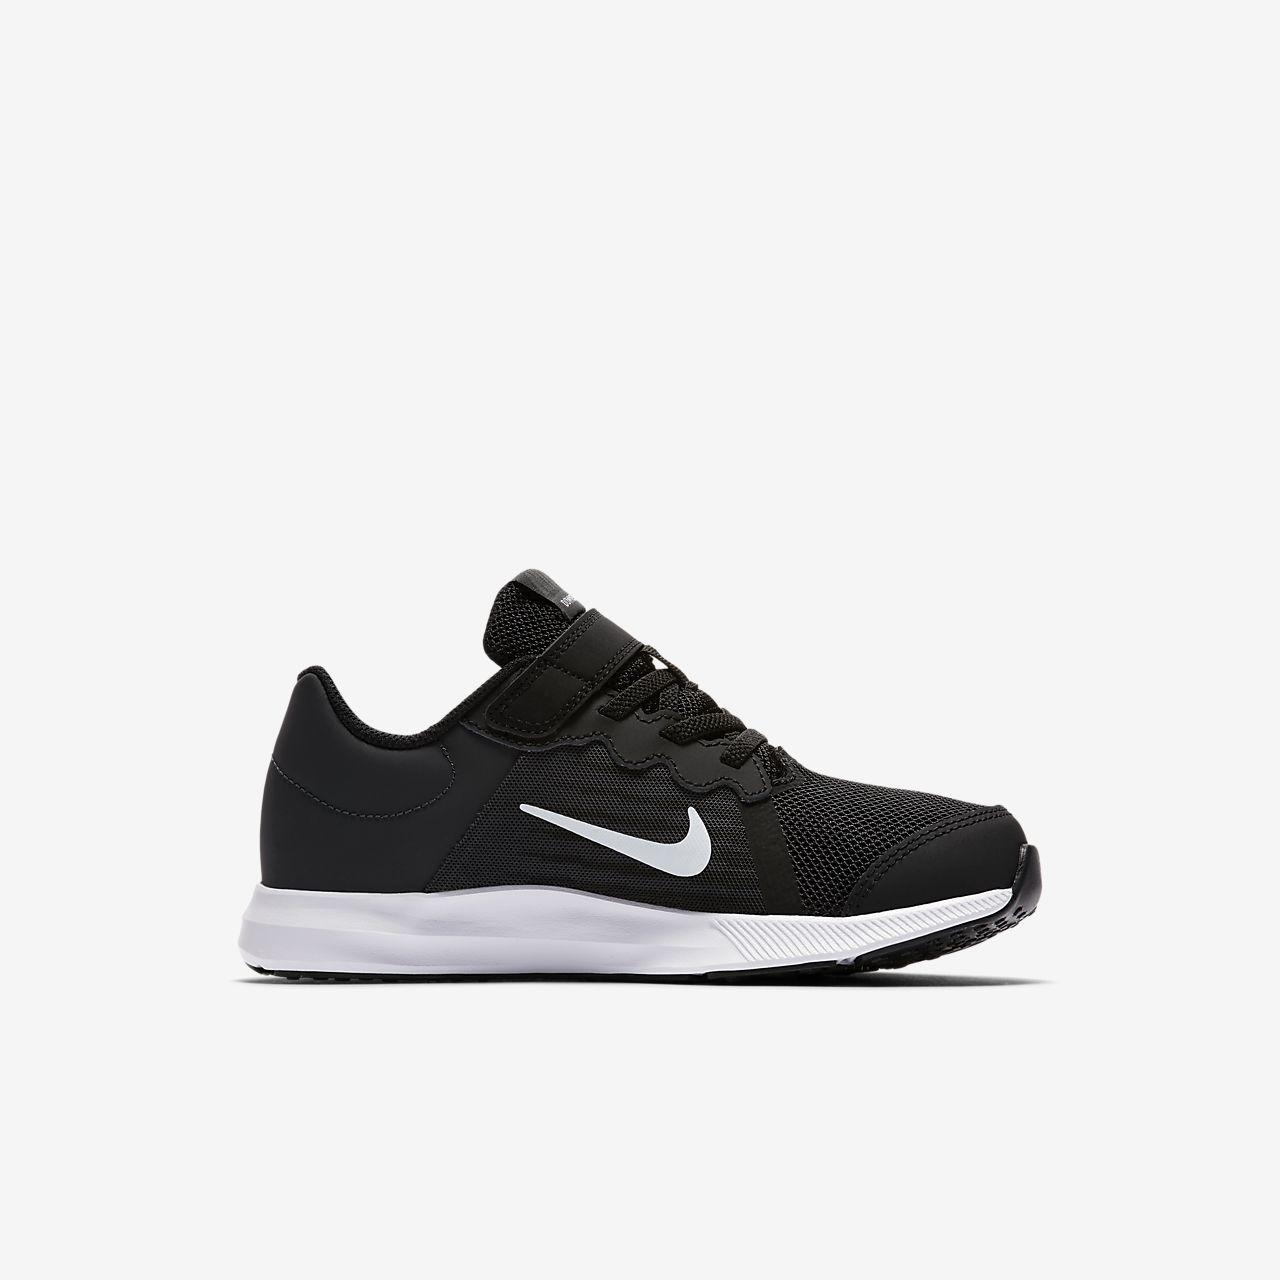 Nike Chaussures Downshifter 8 Nike vMzJjO